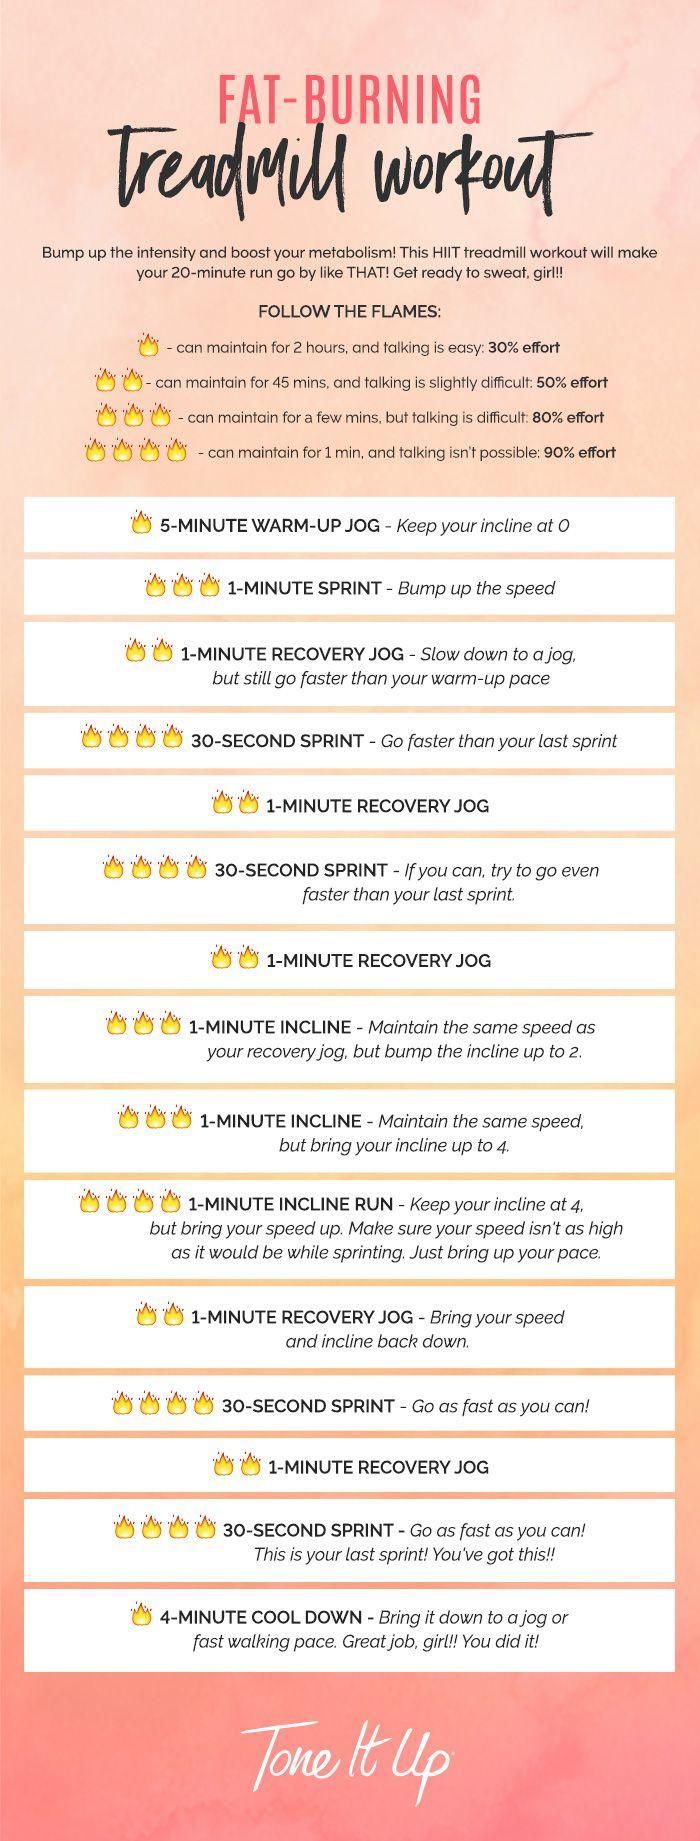 TIU HIIT treadmill workout